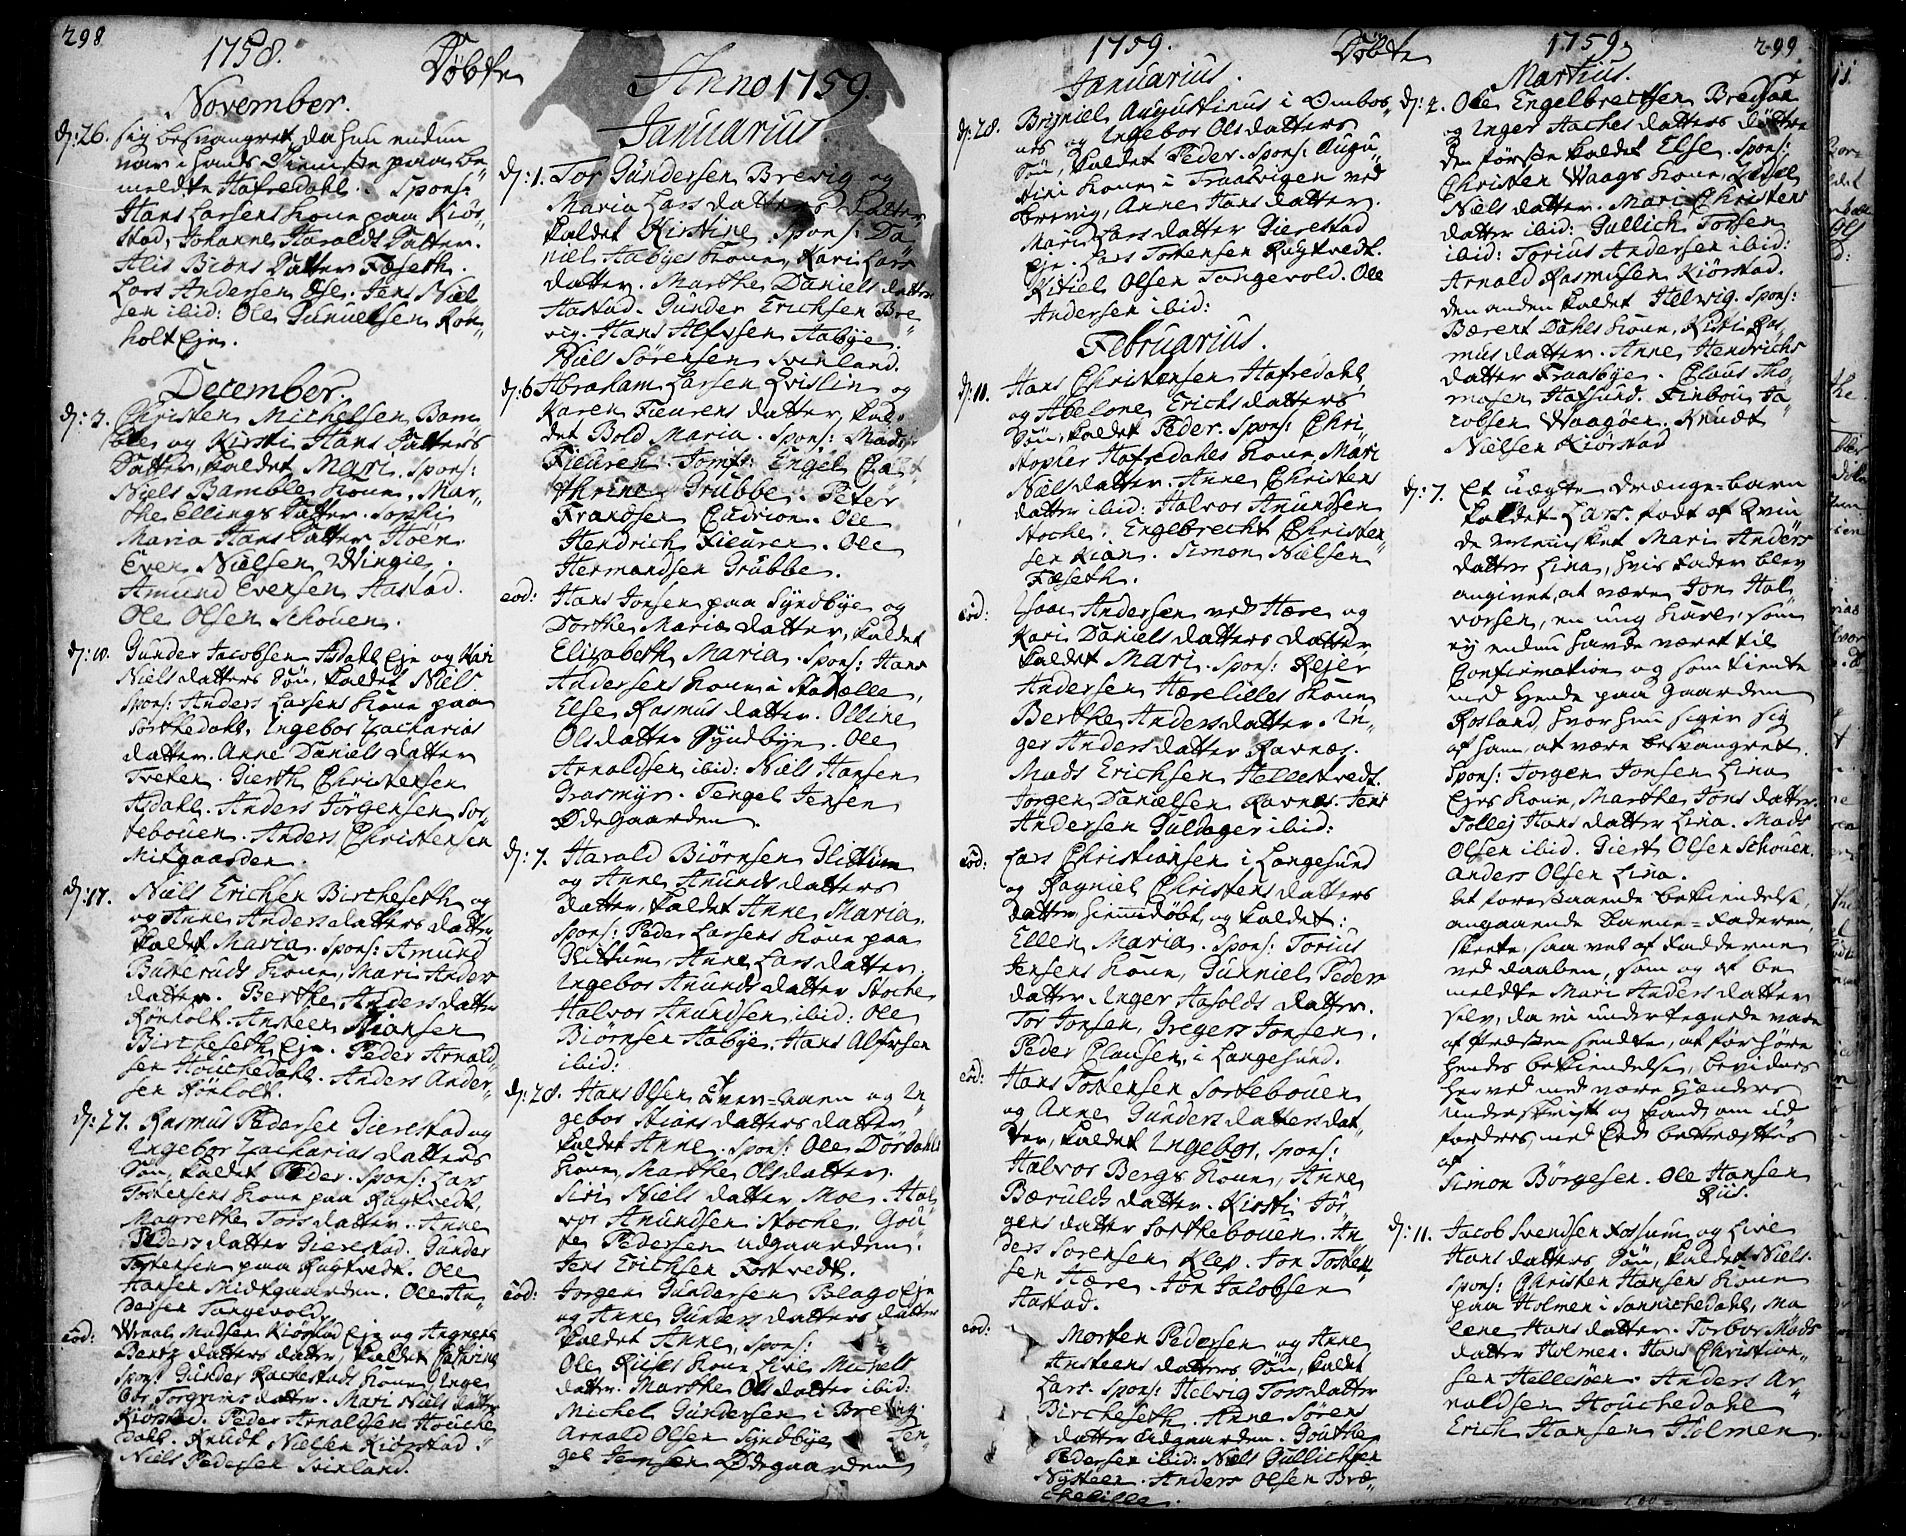 SAKO, Bamble kirkebøker, F/Fa/L0001: Ministerialbok nr. I 1, 1702-1774, s. 298-299